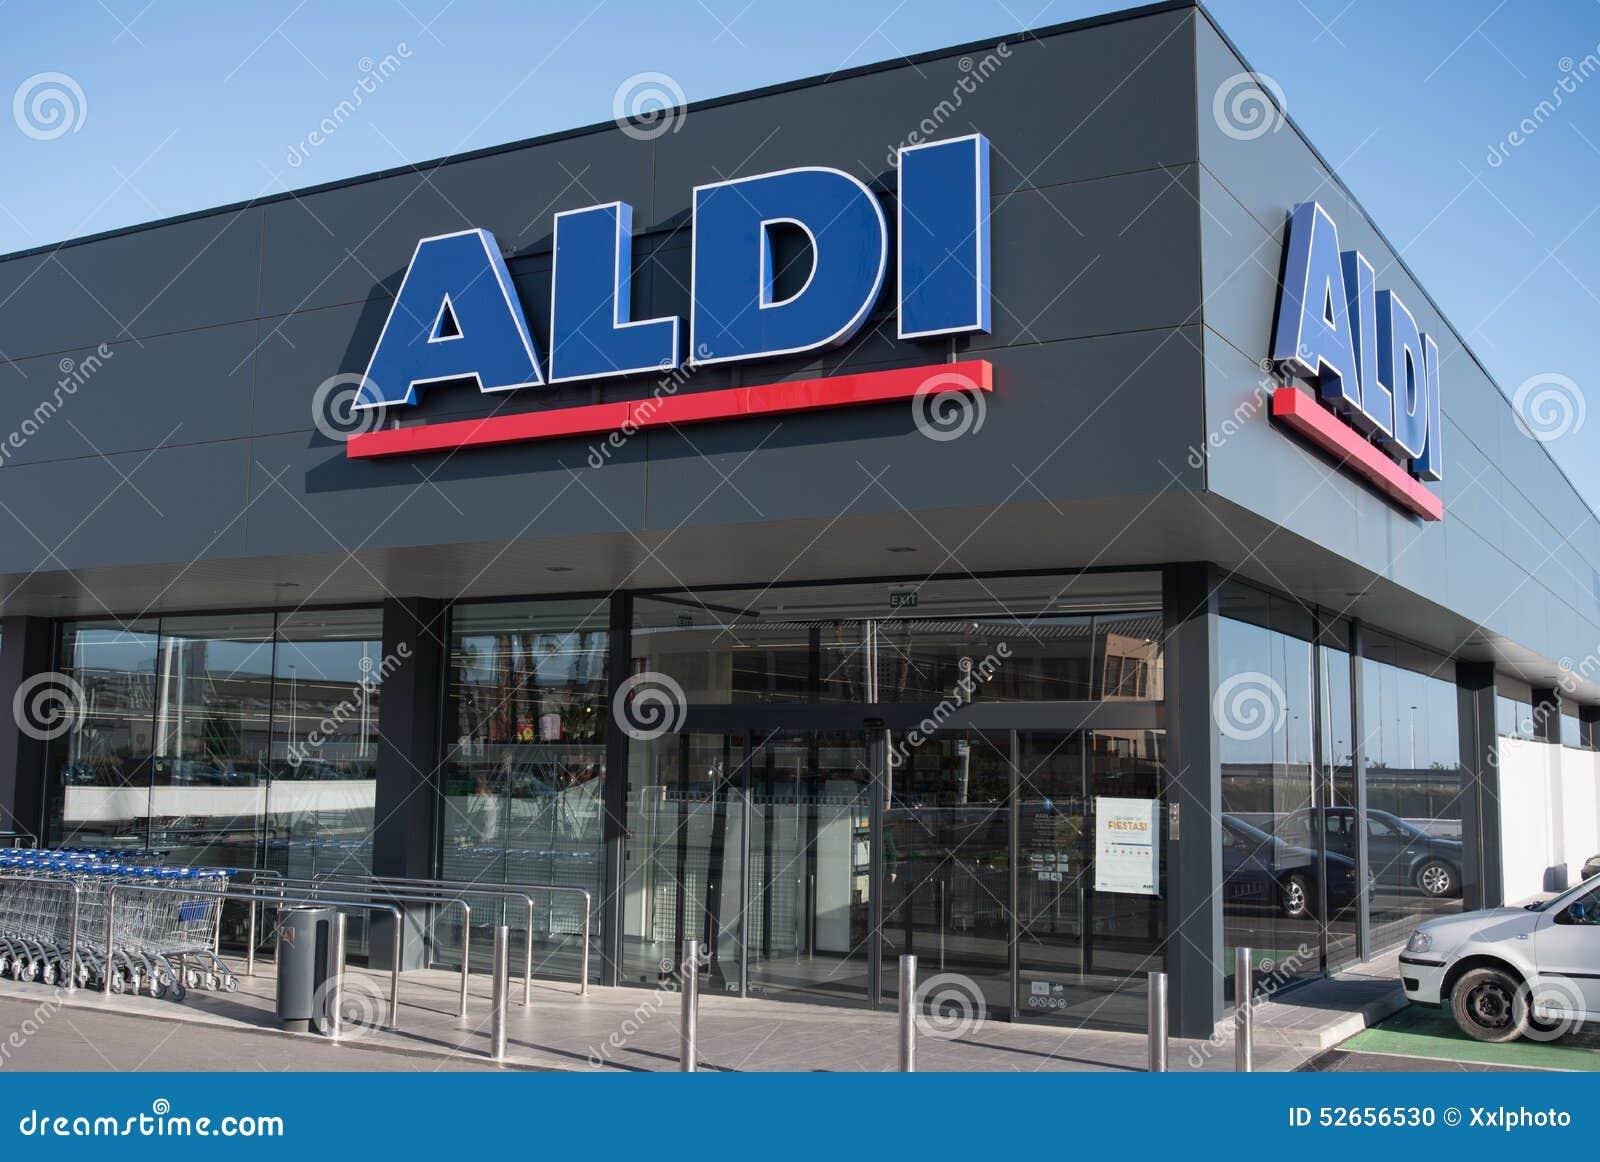 Aldi Food Market Store Hours